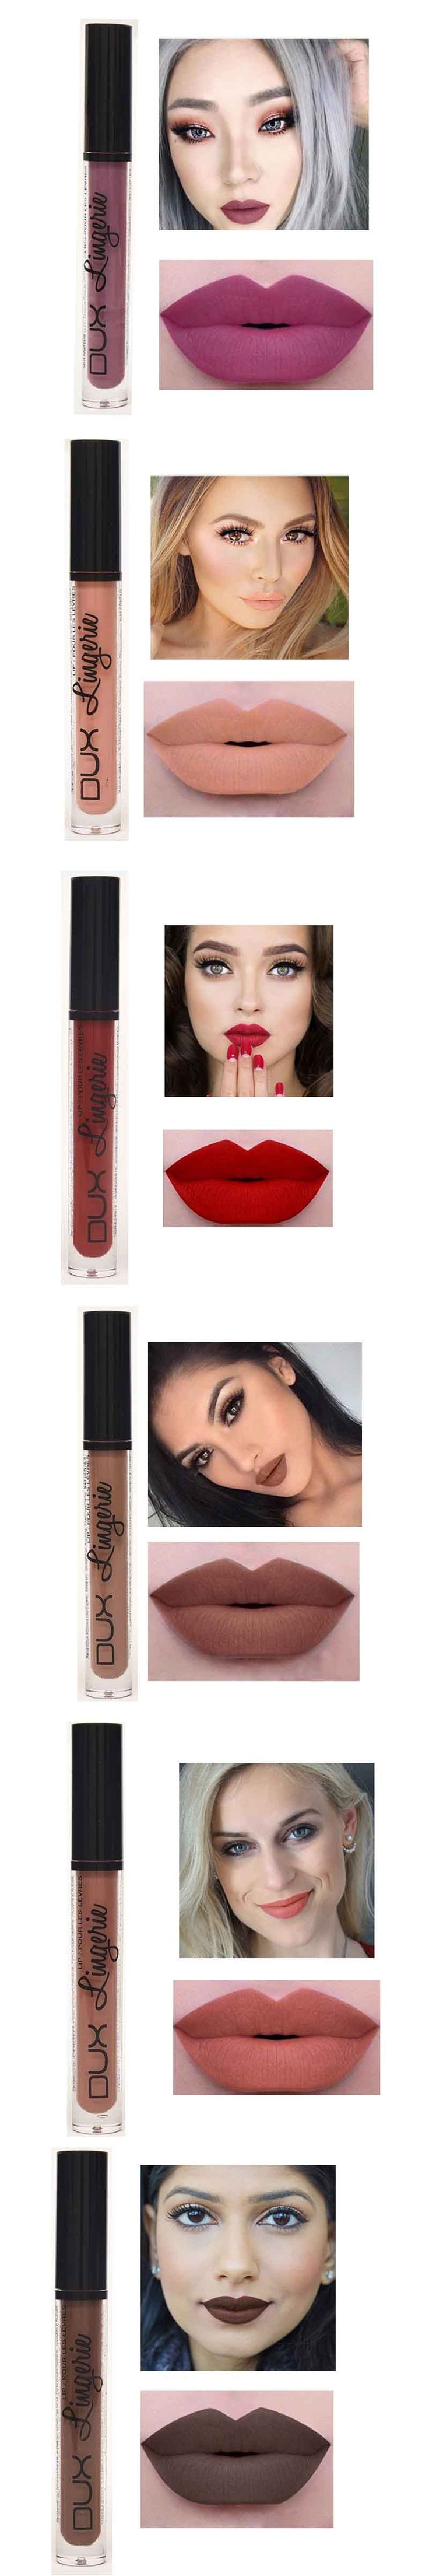 2017New!! Brand Makeup Lipstick Matte Lipstick Brown Nude Chocolate Color Liquid Lipstick Lip Gloss Matte Batom Matte lip glaze